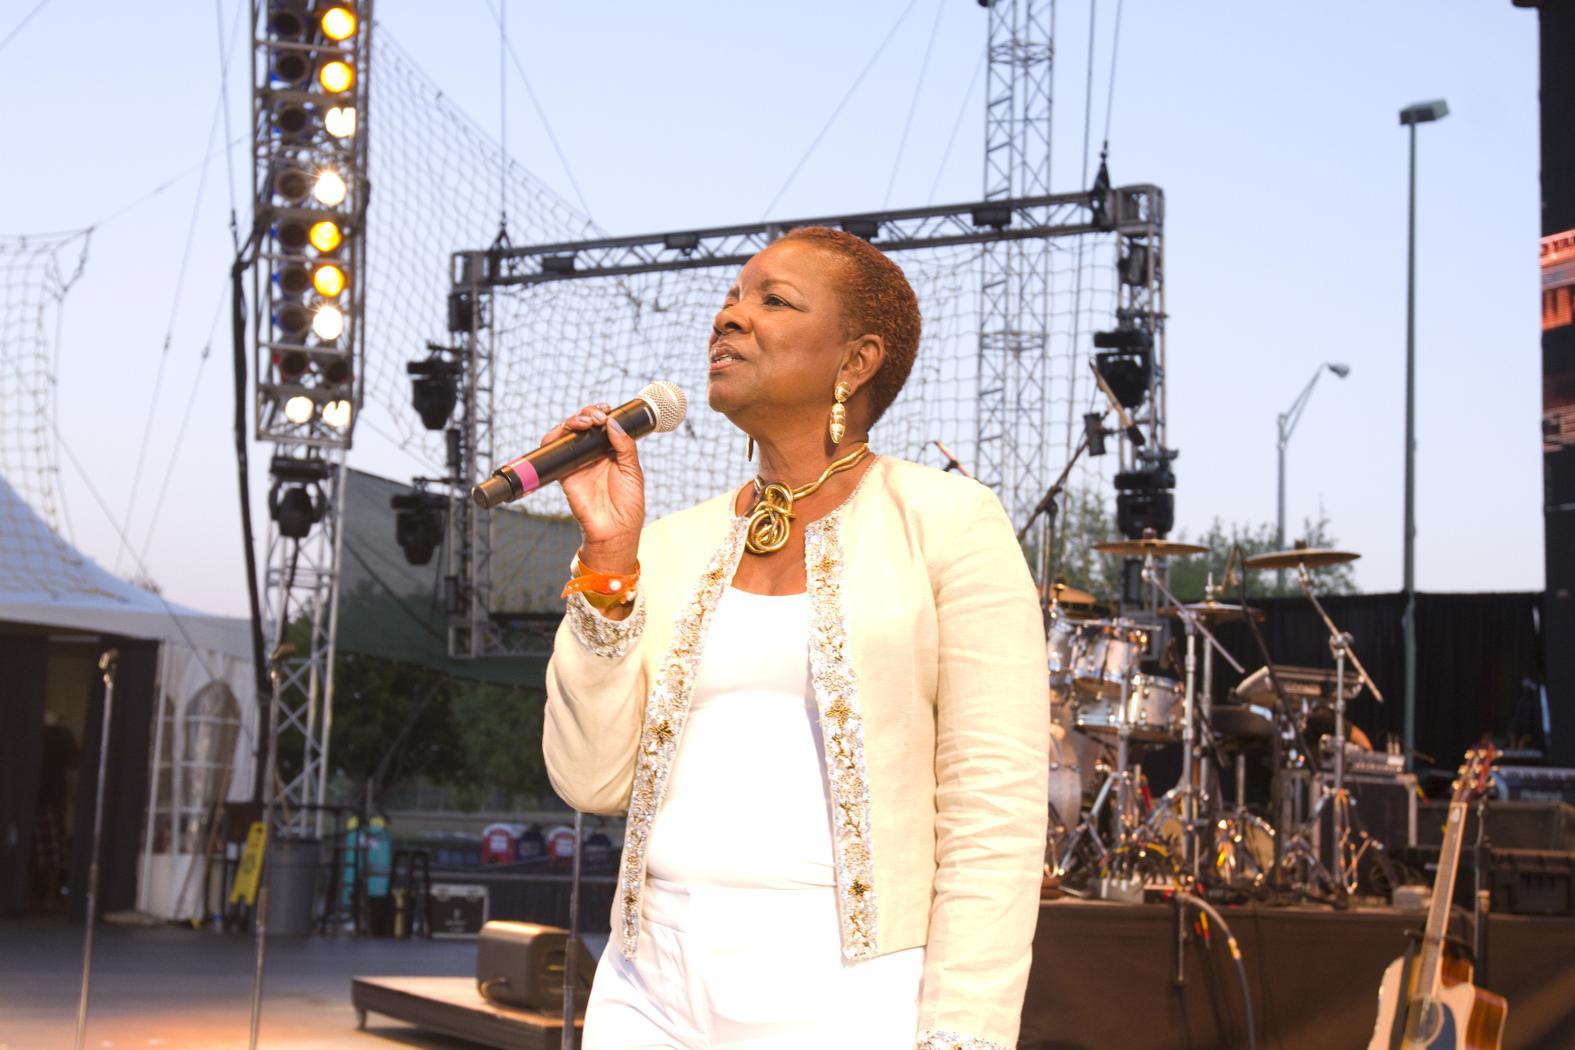 Shirley Gibson